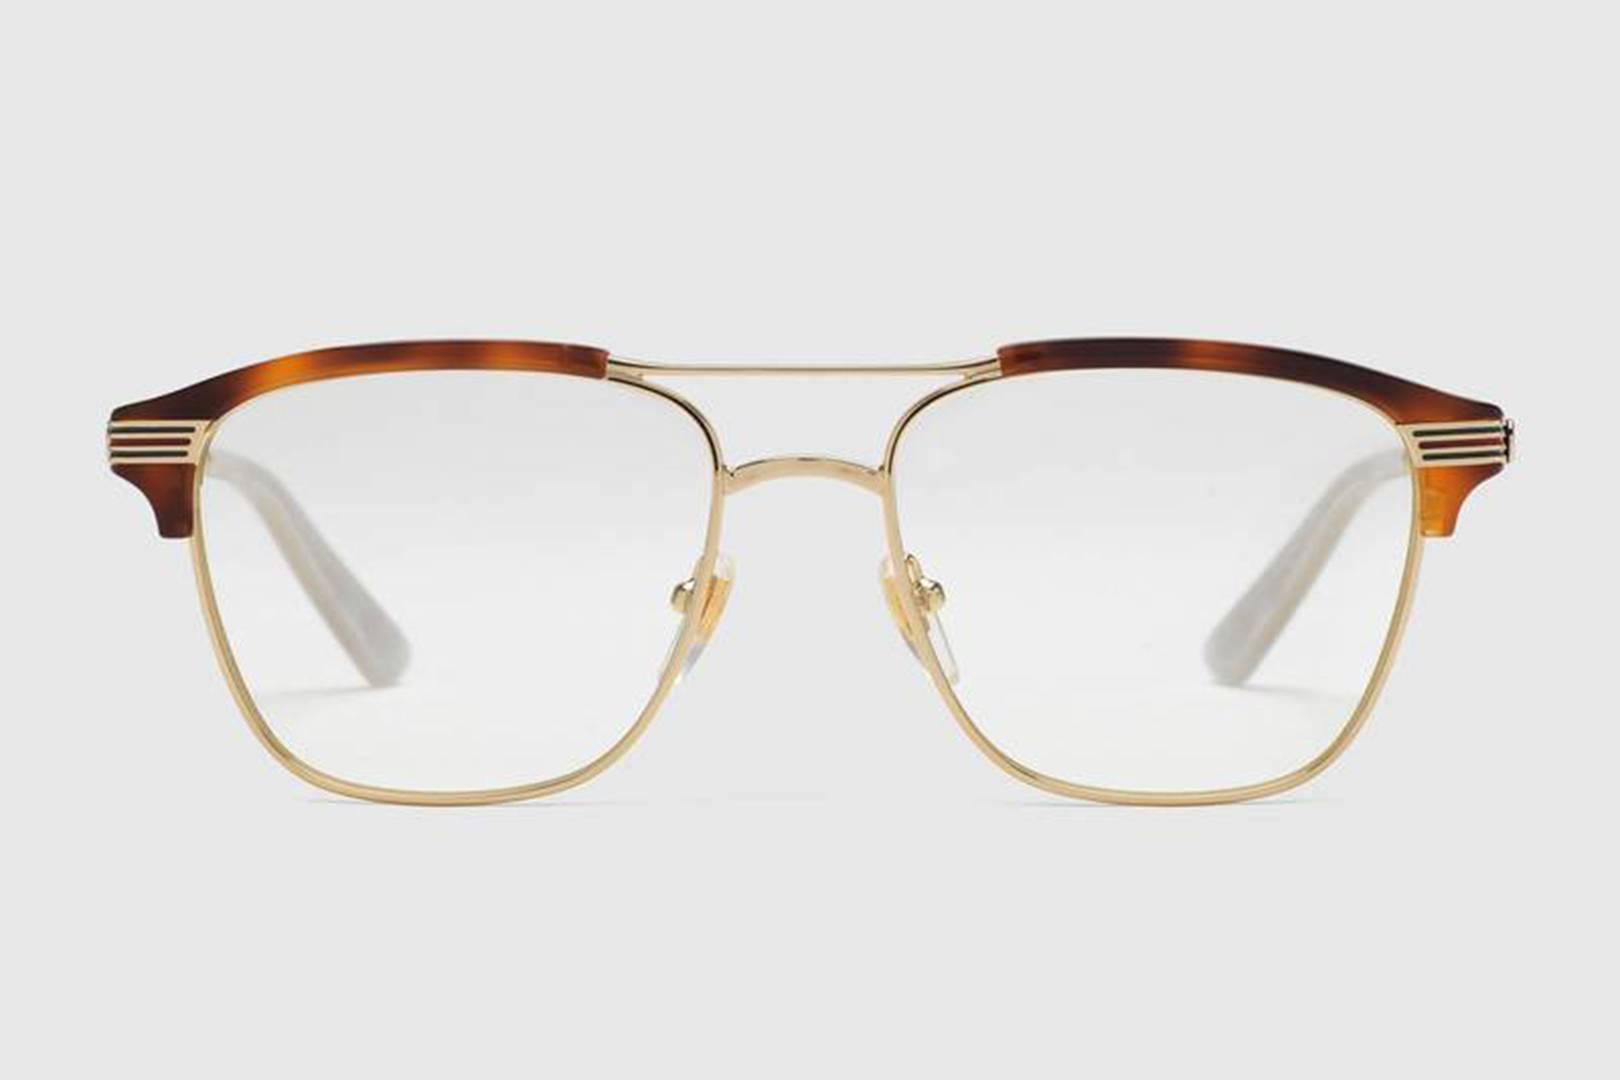 5b057fbc65f7 Best men's eyeglasses 2019 | British GQ